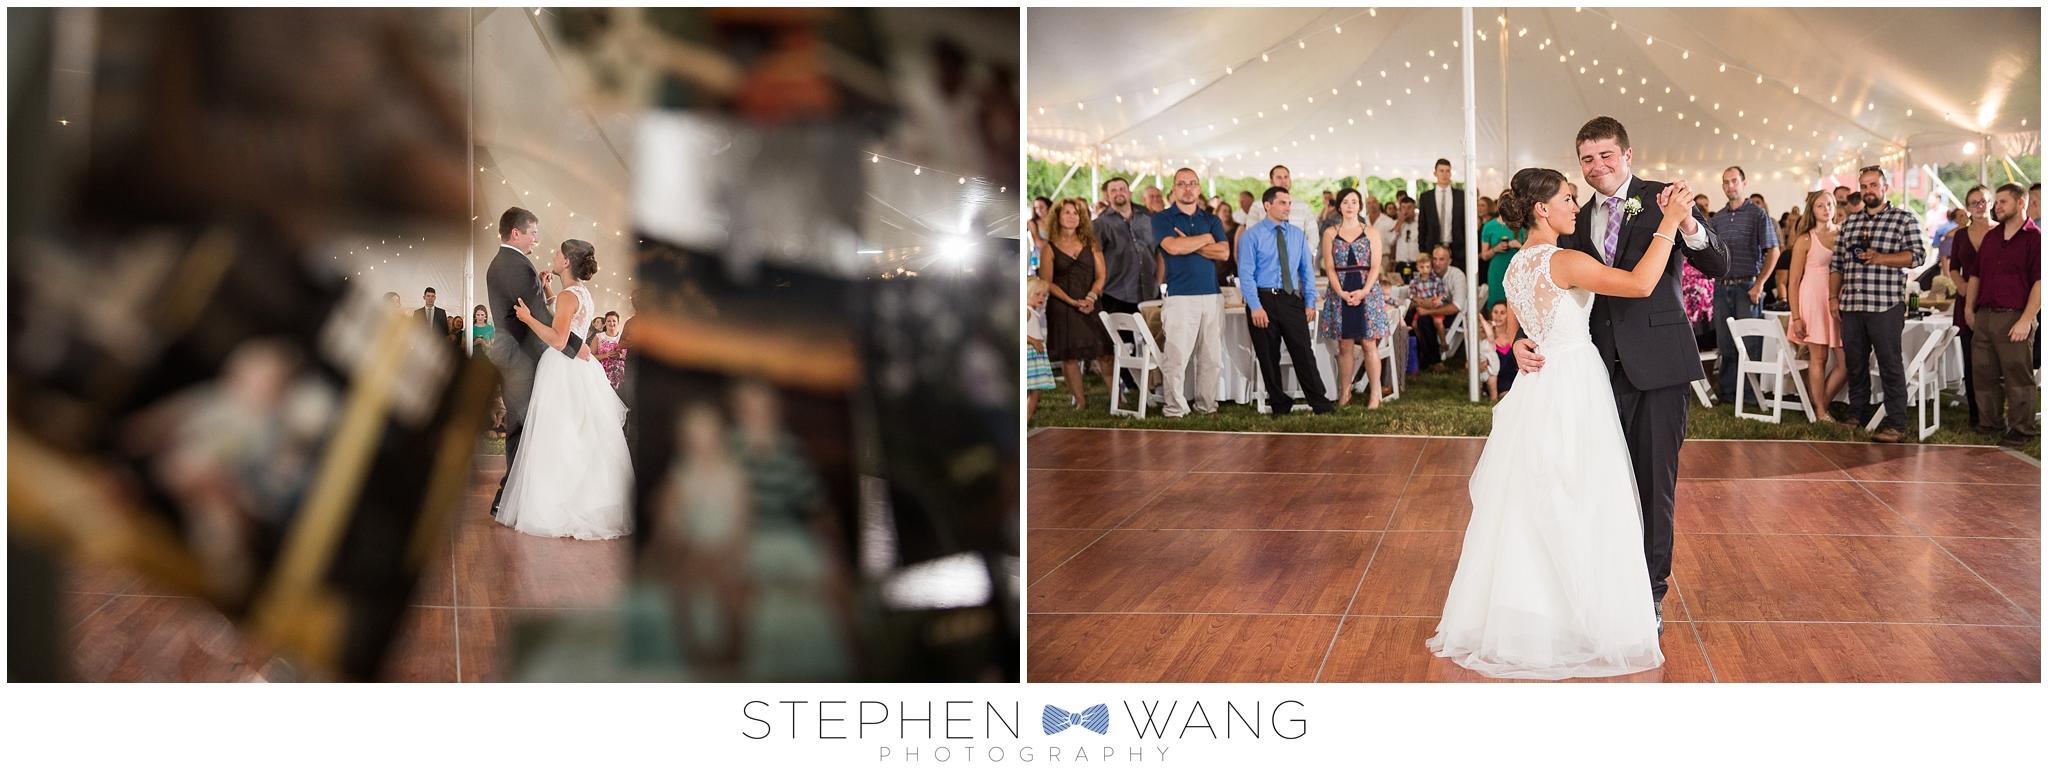 Stephen Wang Photography wedding photographer haddam connecticut wedding connecticut photographer philadlephia photographer pennsylvania wedding photographer bride and groom00032.jpg